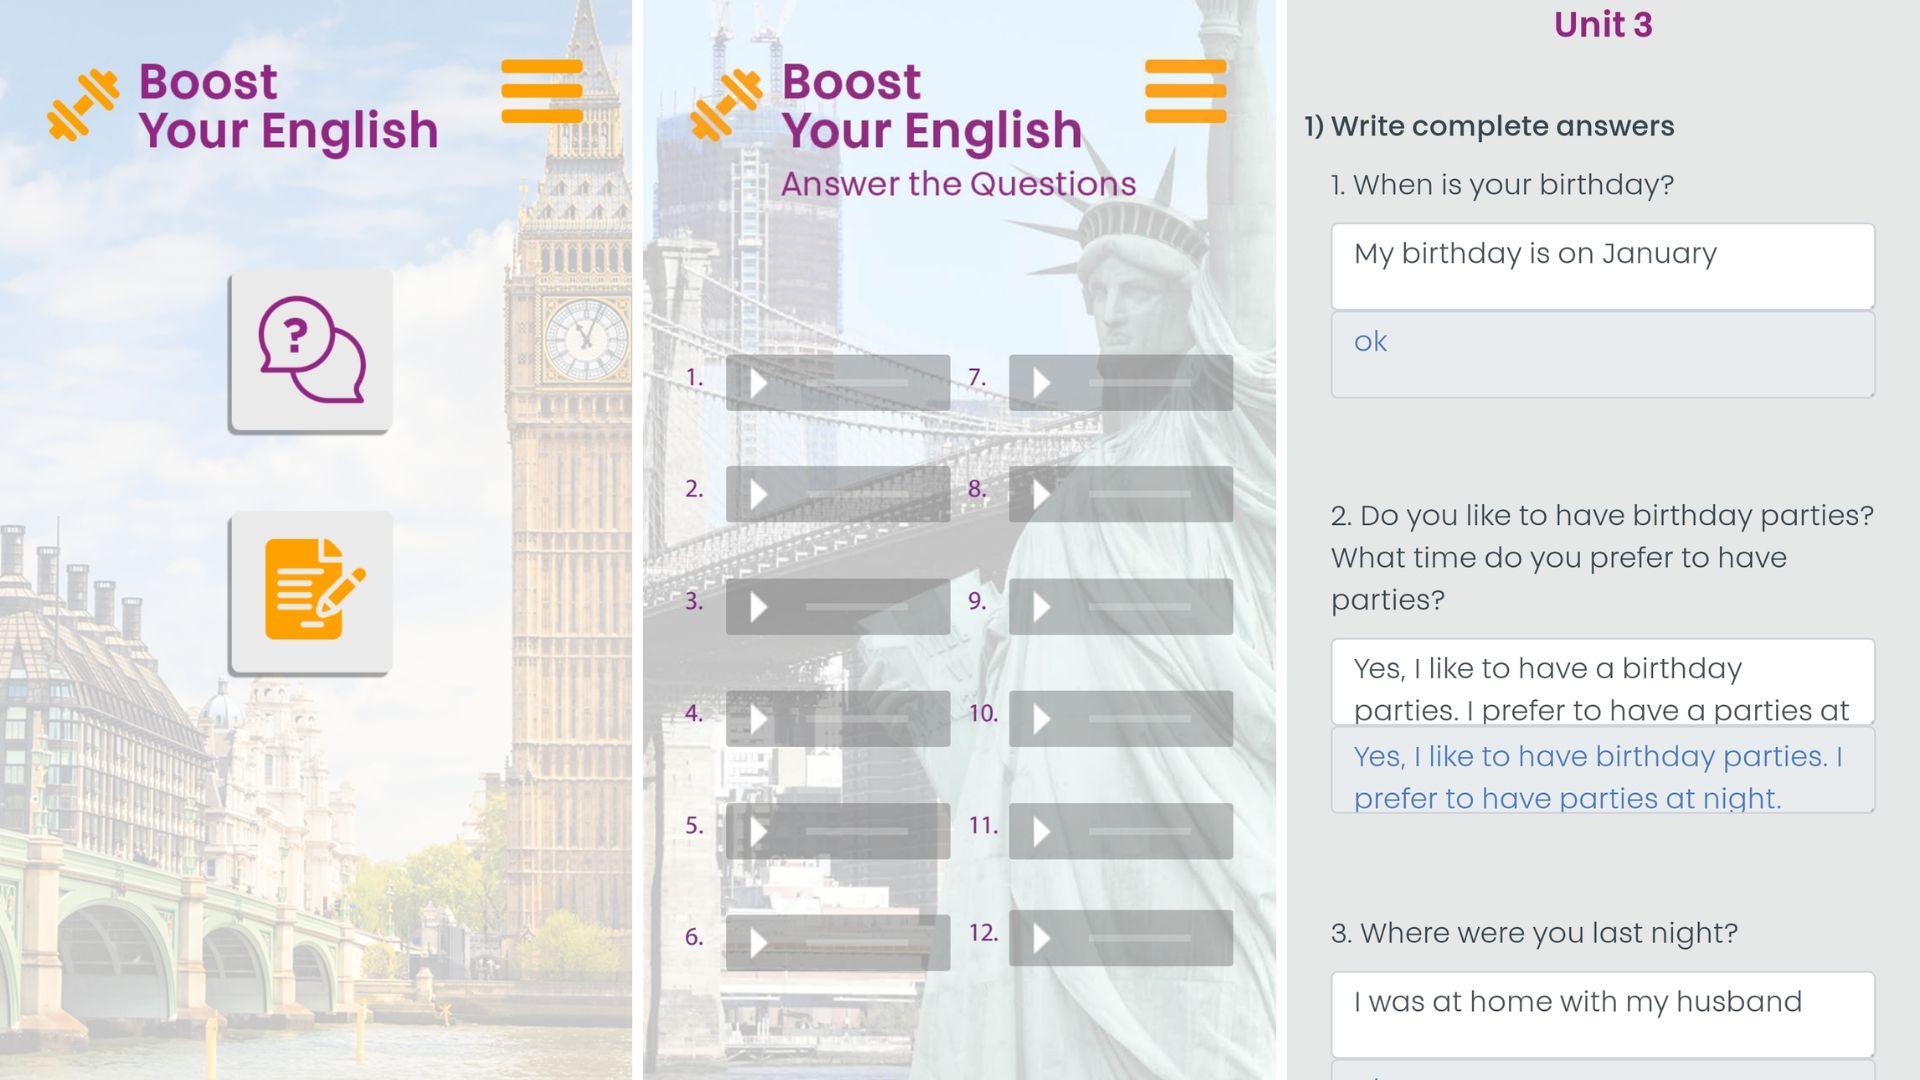 aplicativo park idiomas como usar